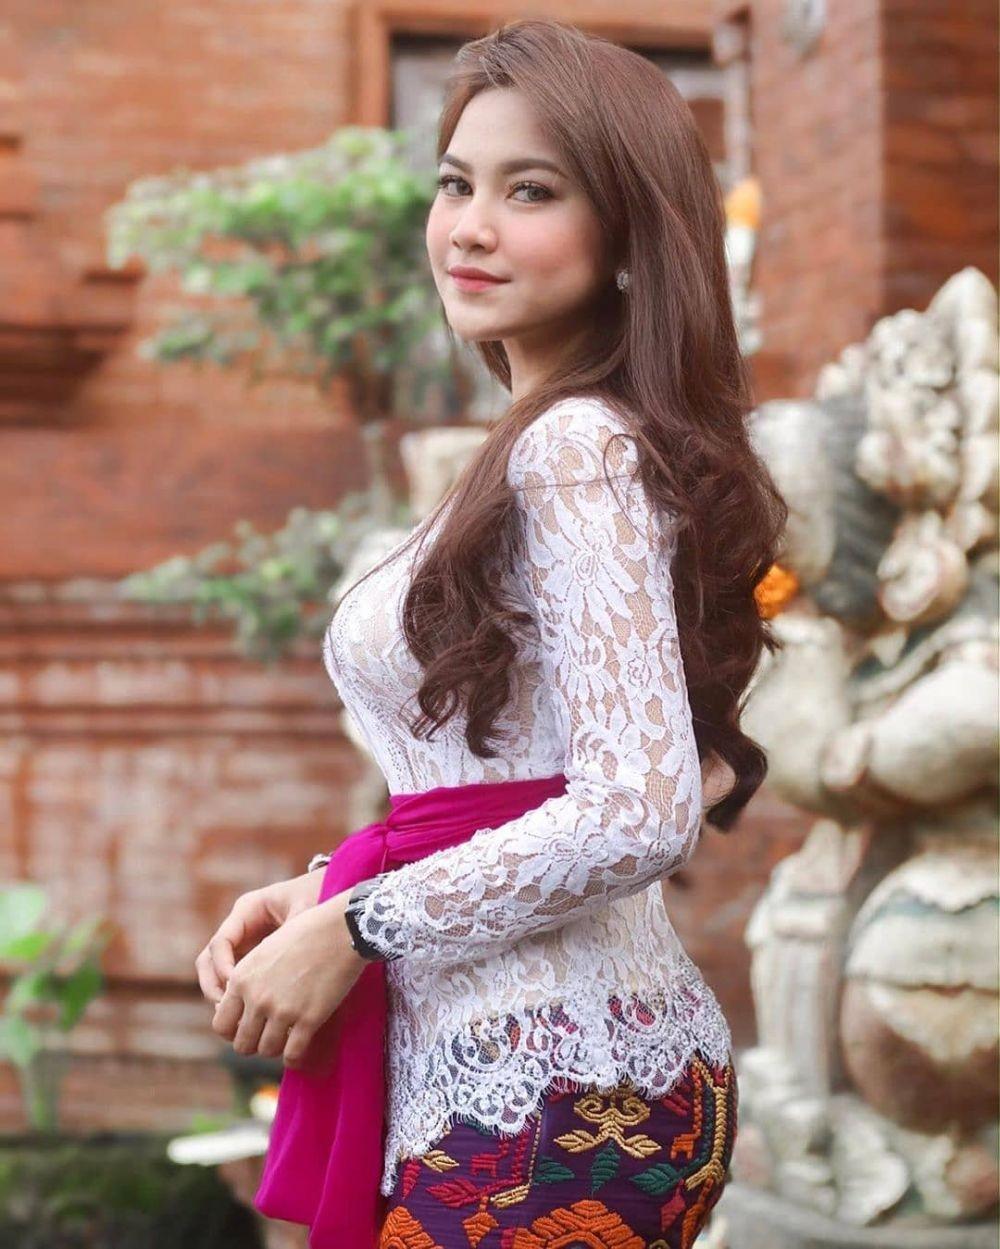 10 Pesona Mahalini Raharja, Dokter Gigi yang Ikut Indonesian Idol